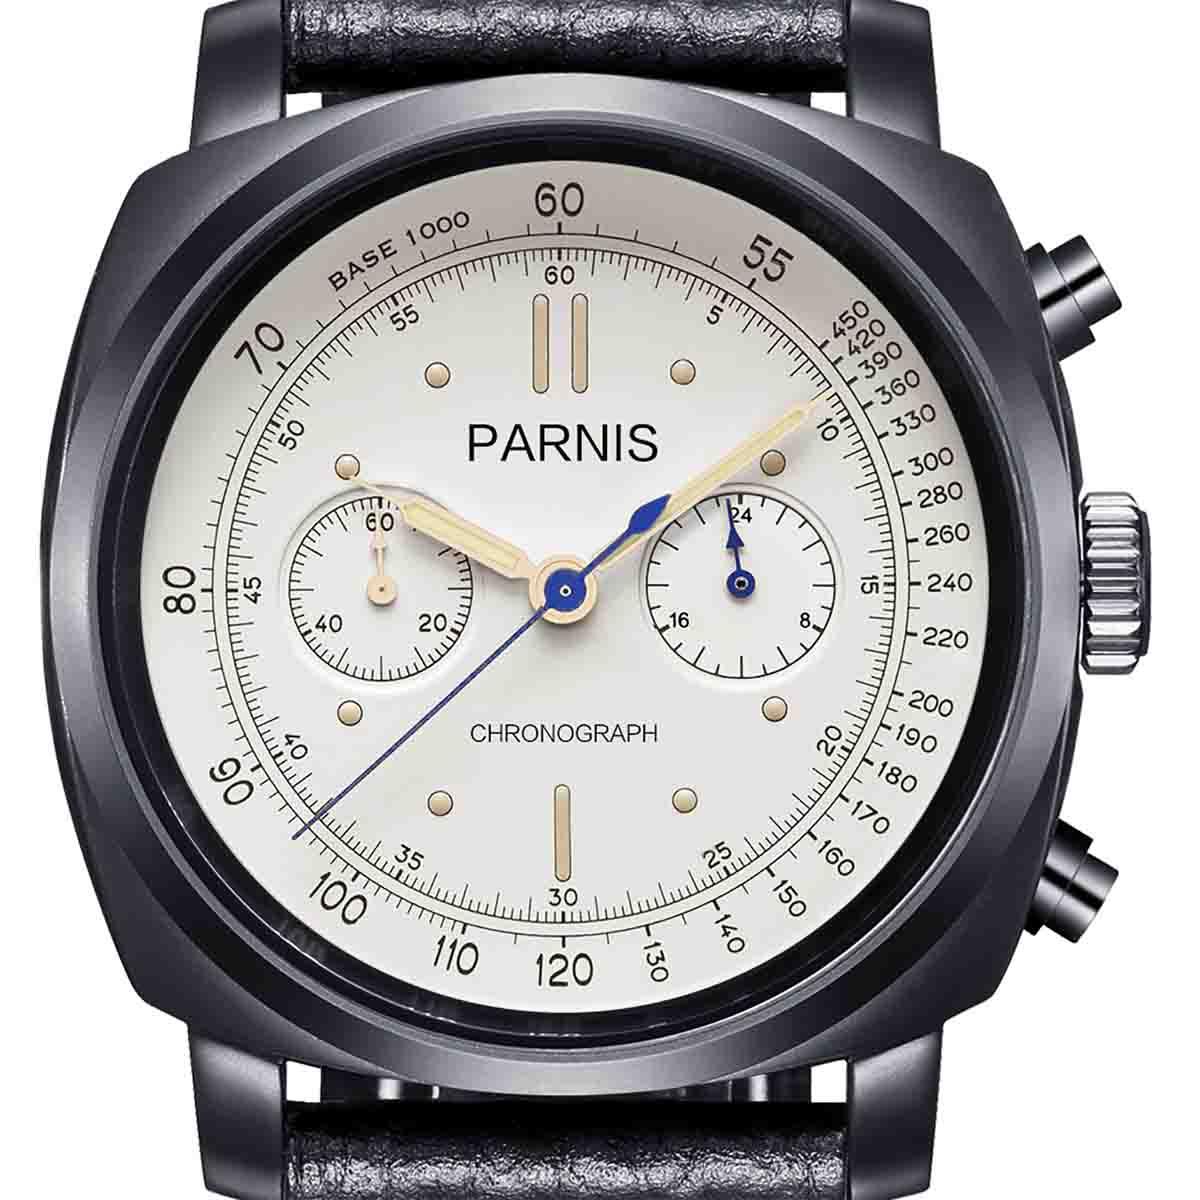 【NEW】PARNIS パーニス クォーツ 腕時計 [PA6046-B-S5EL-WHbkBKw] 並行輸入品 純正ケース メーカー保証12ヶ月